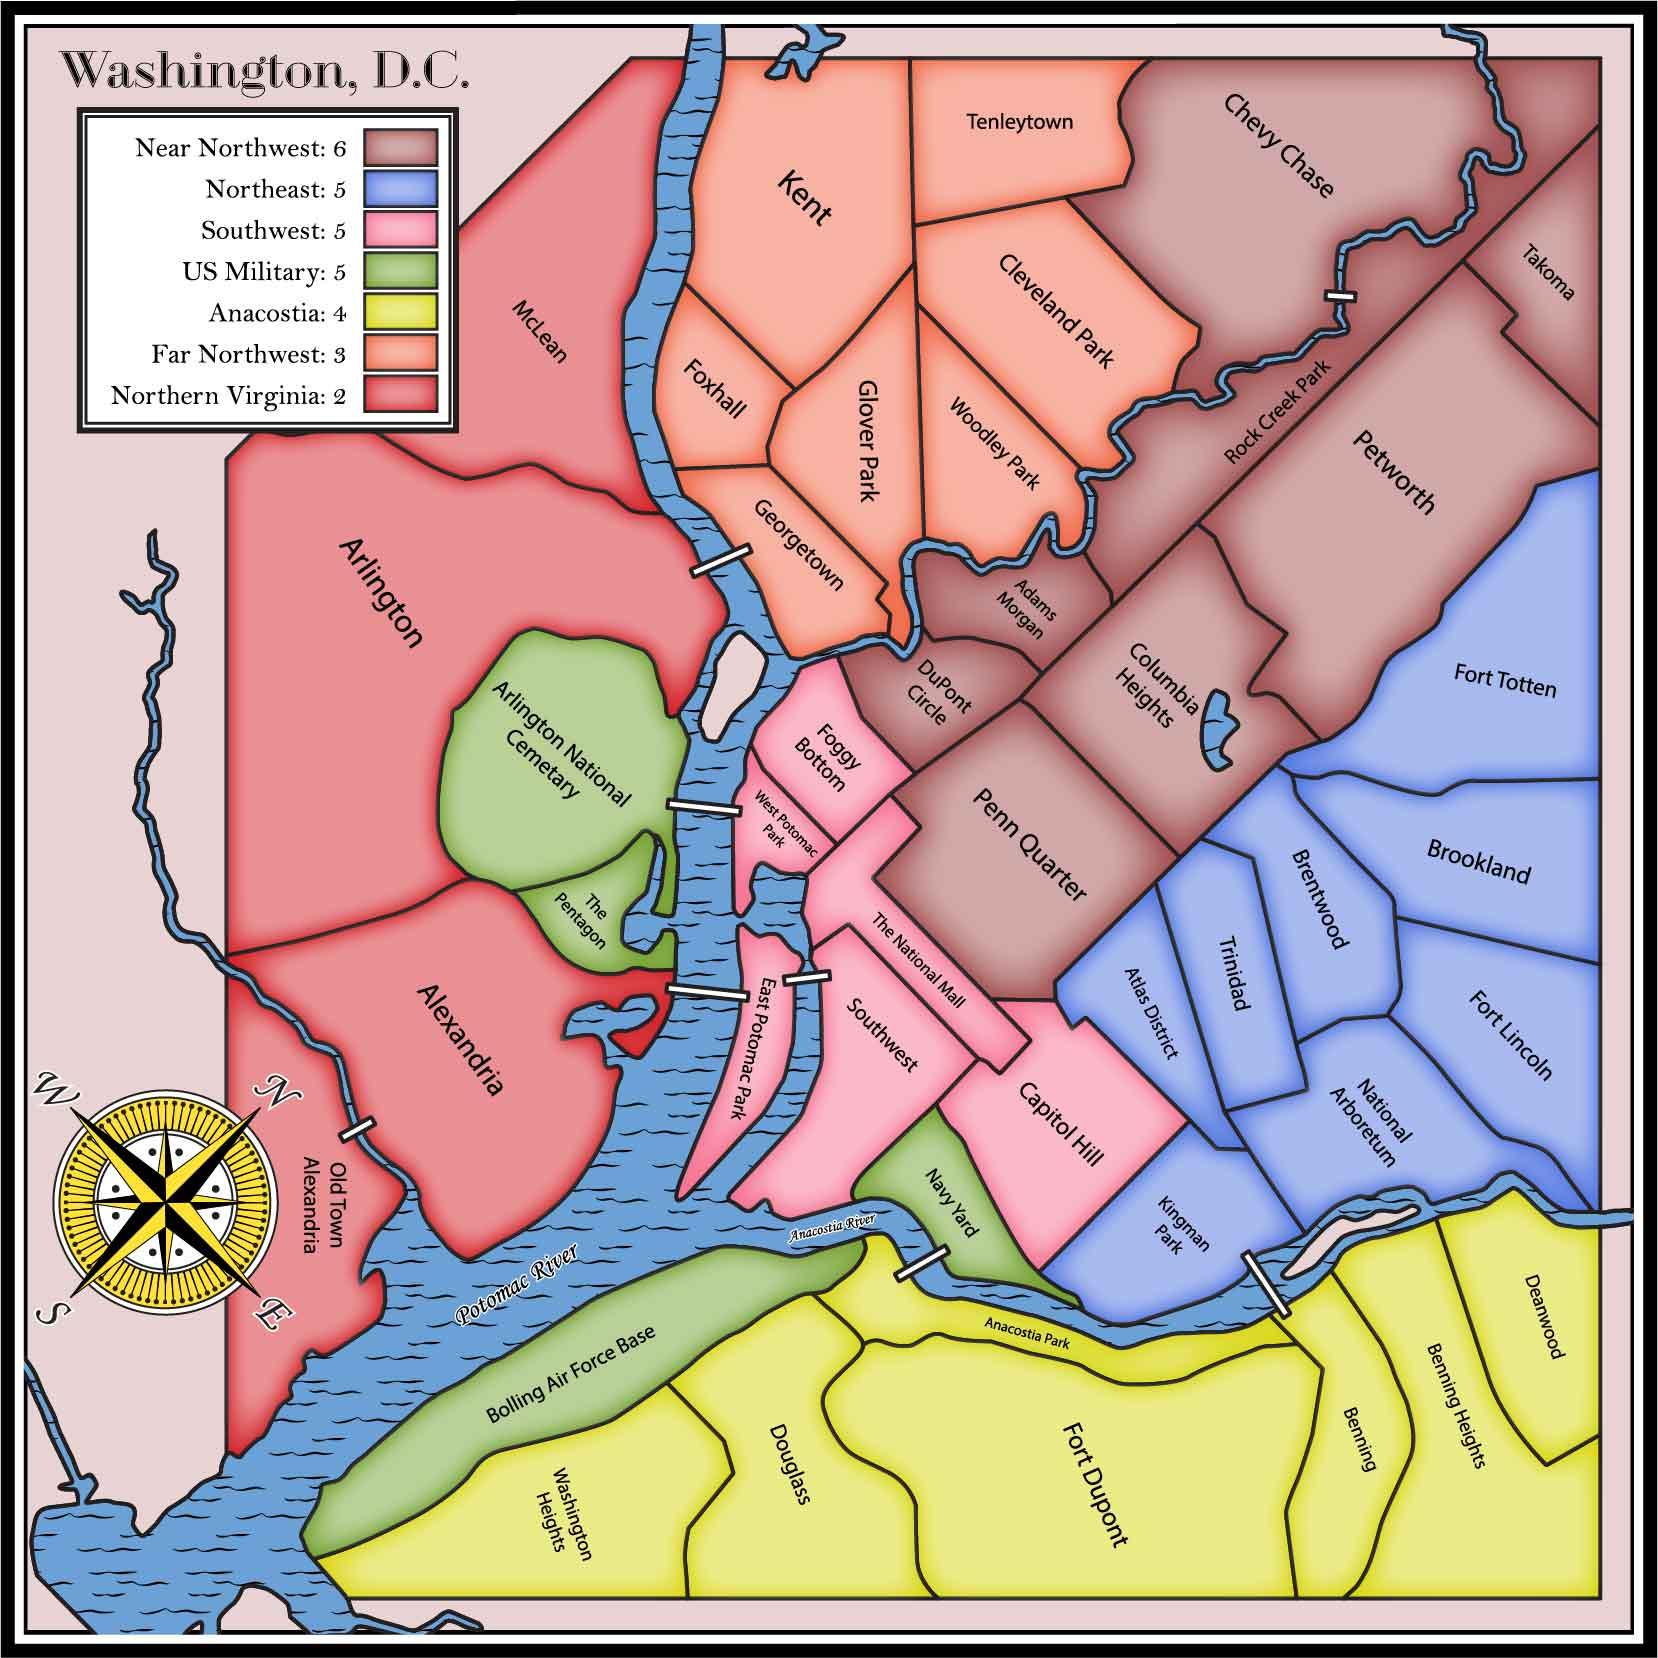 Best Of Diagram Washington Dc Map Download More Maps Diagram - Washington dc mall map pdf